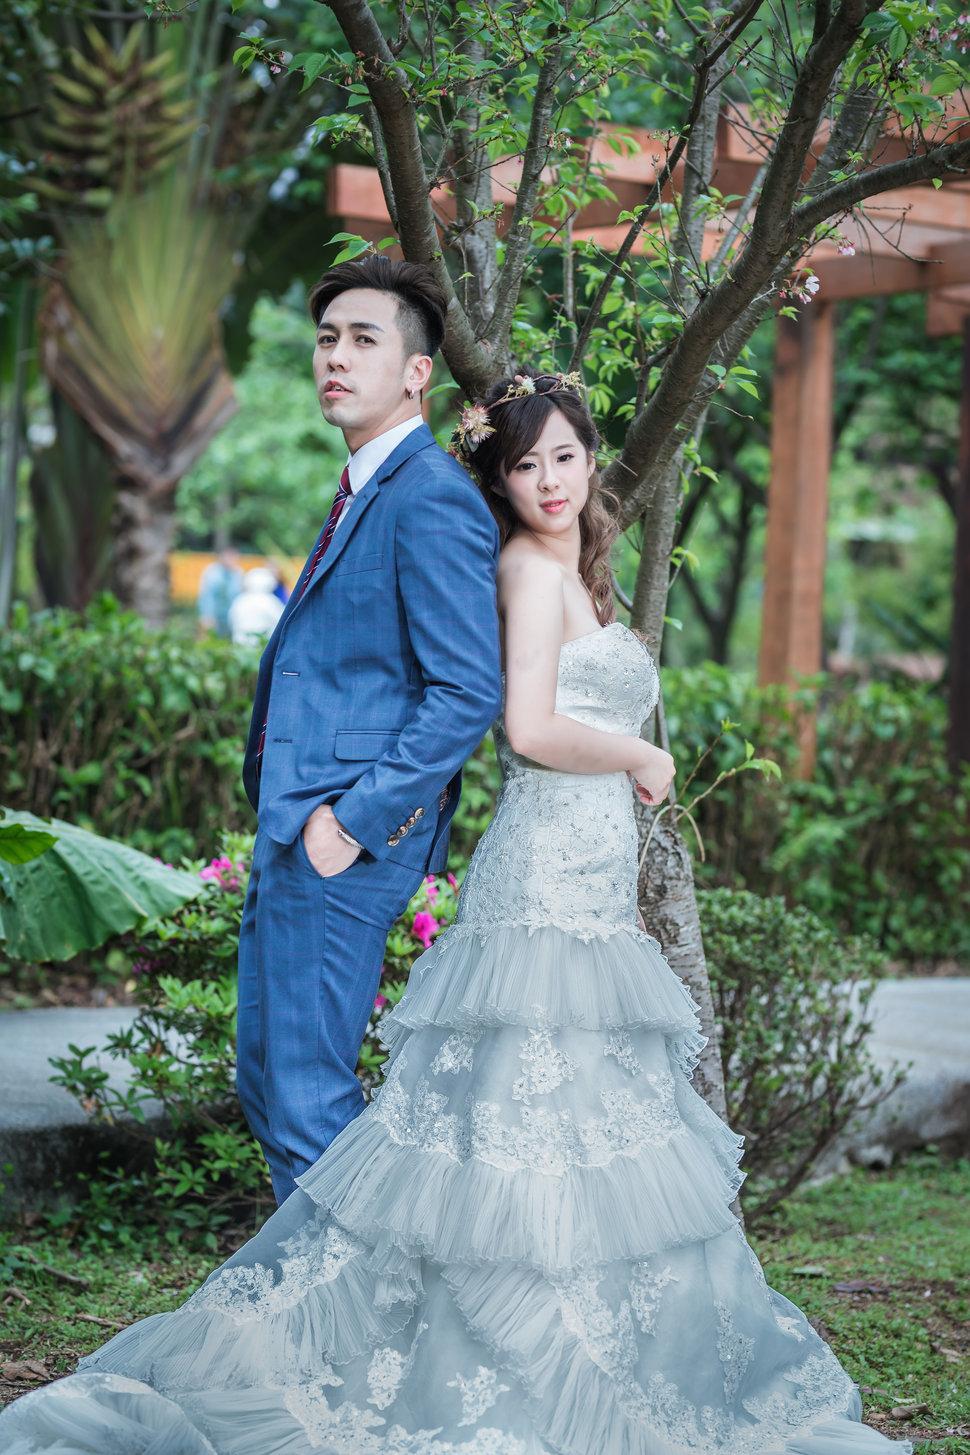 5D4_7152 - Promaker婚禮紀錄攝影團隊婚攝豪哥《結婚吧》